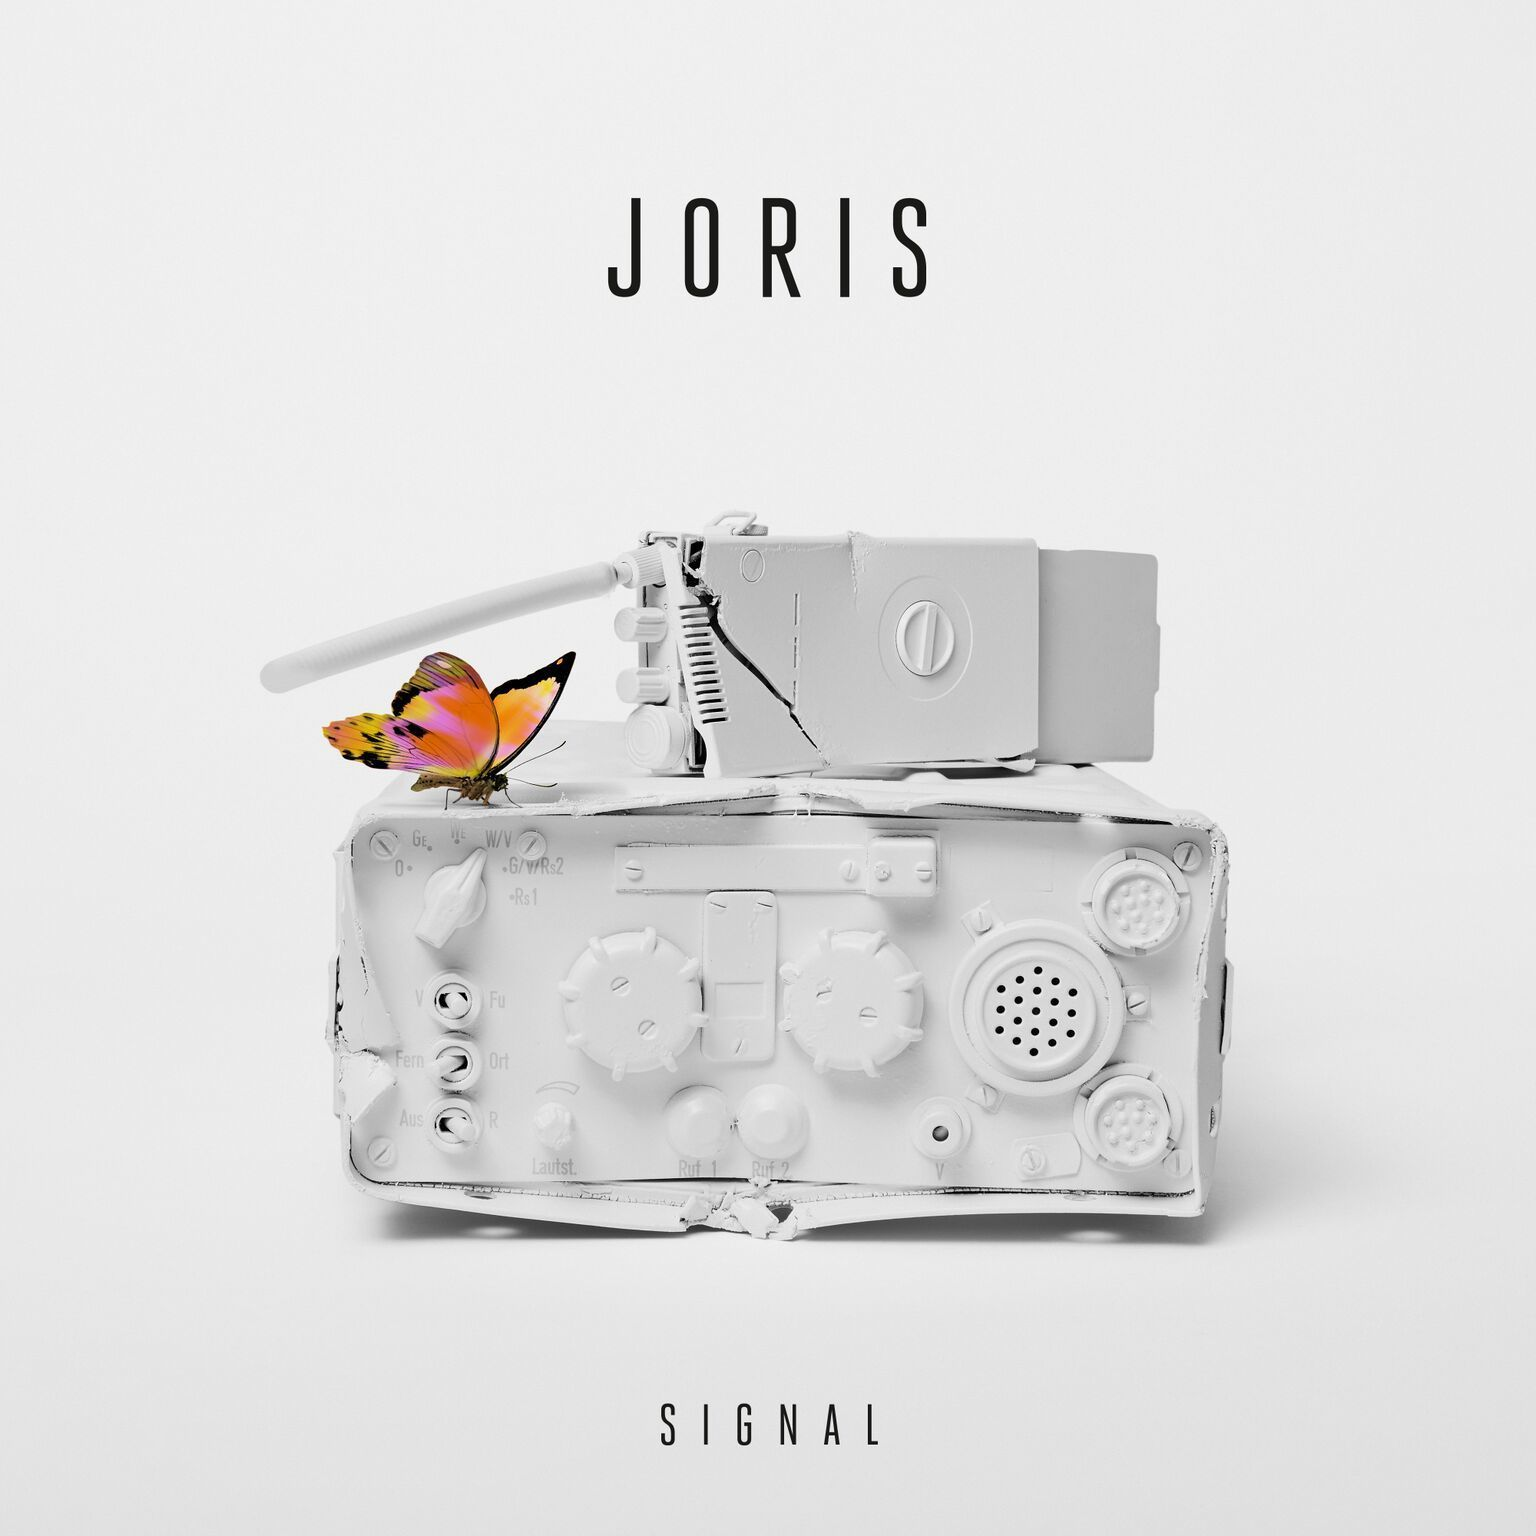 EYECANDY für Joris | Kunde: Joris/Four Music | Agentur/Artwork: Zentrale Berlin